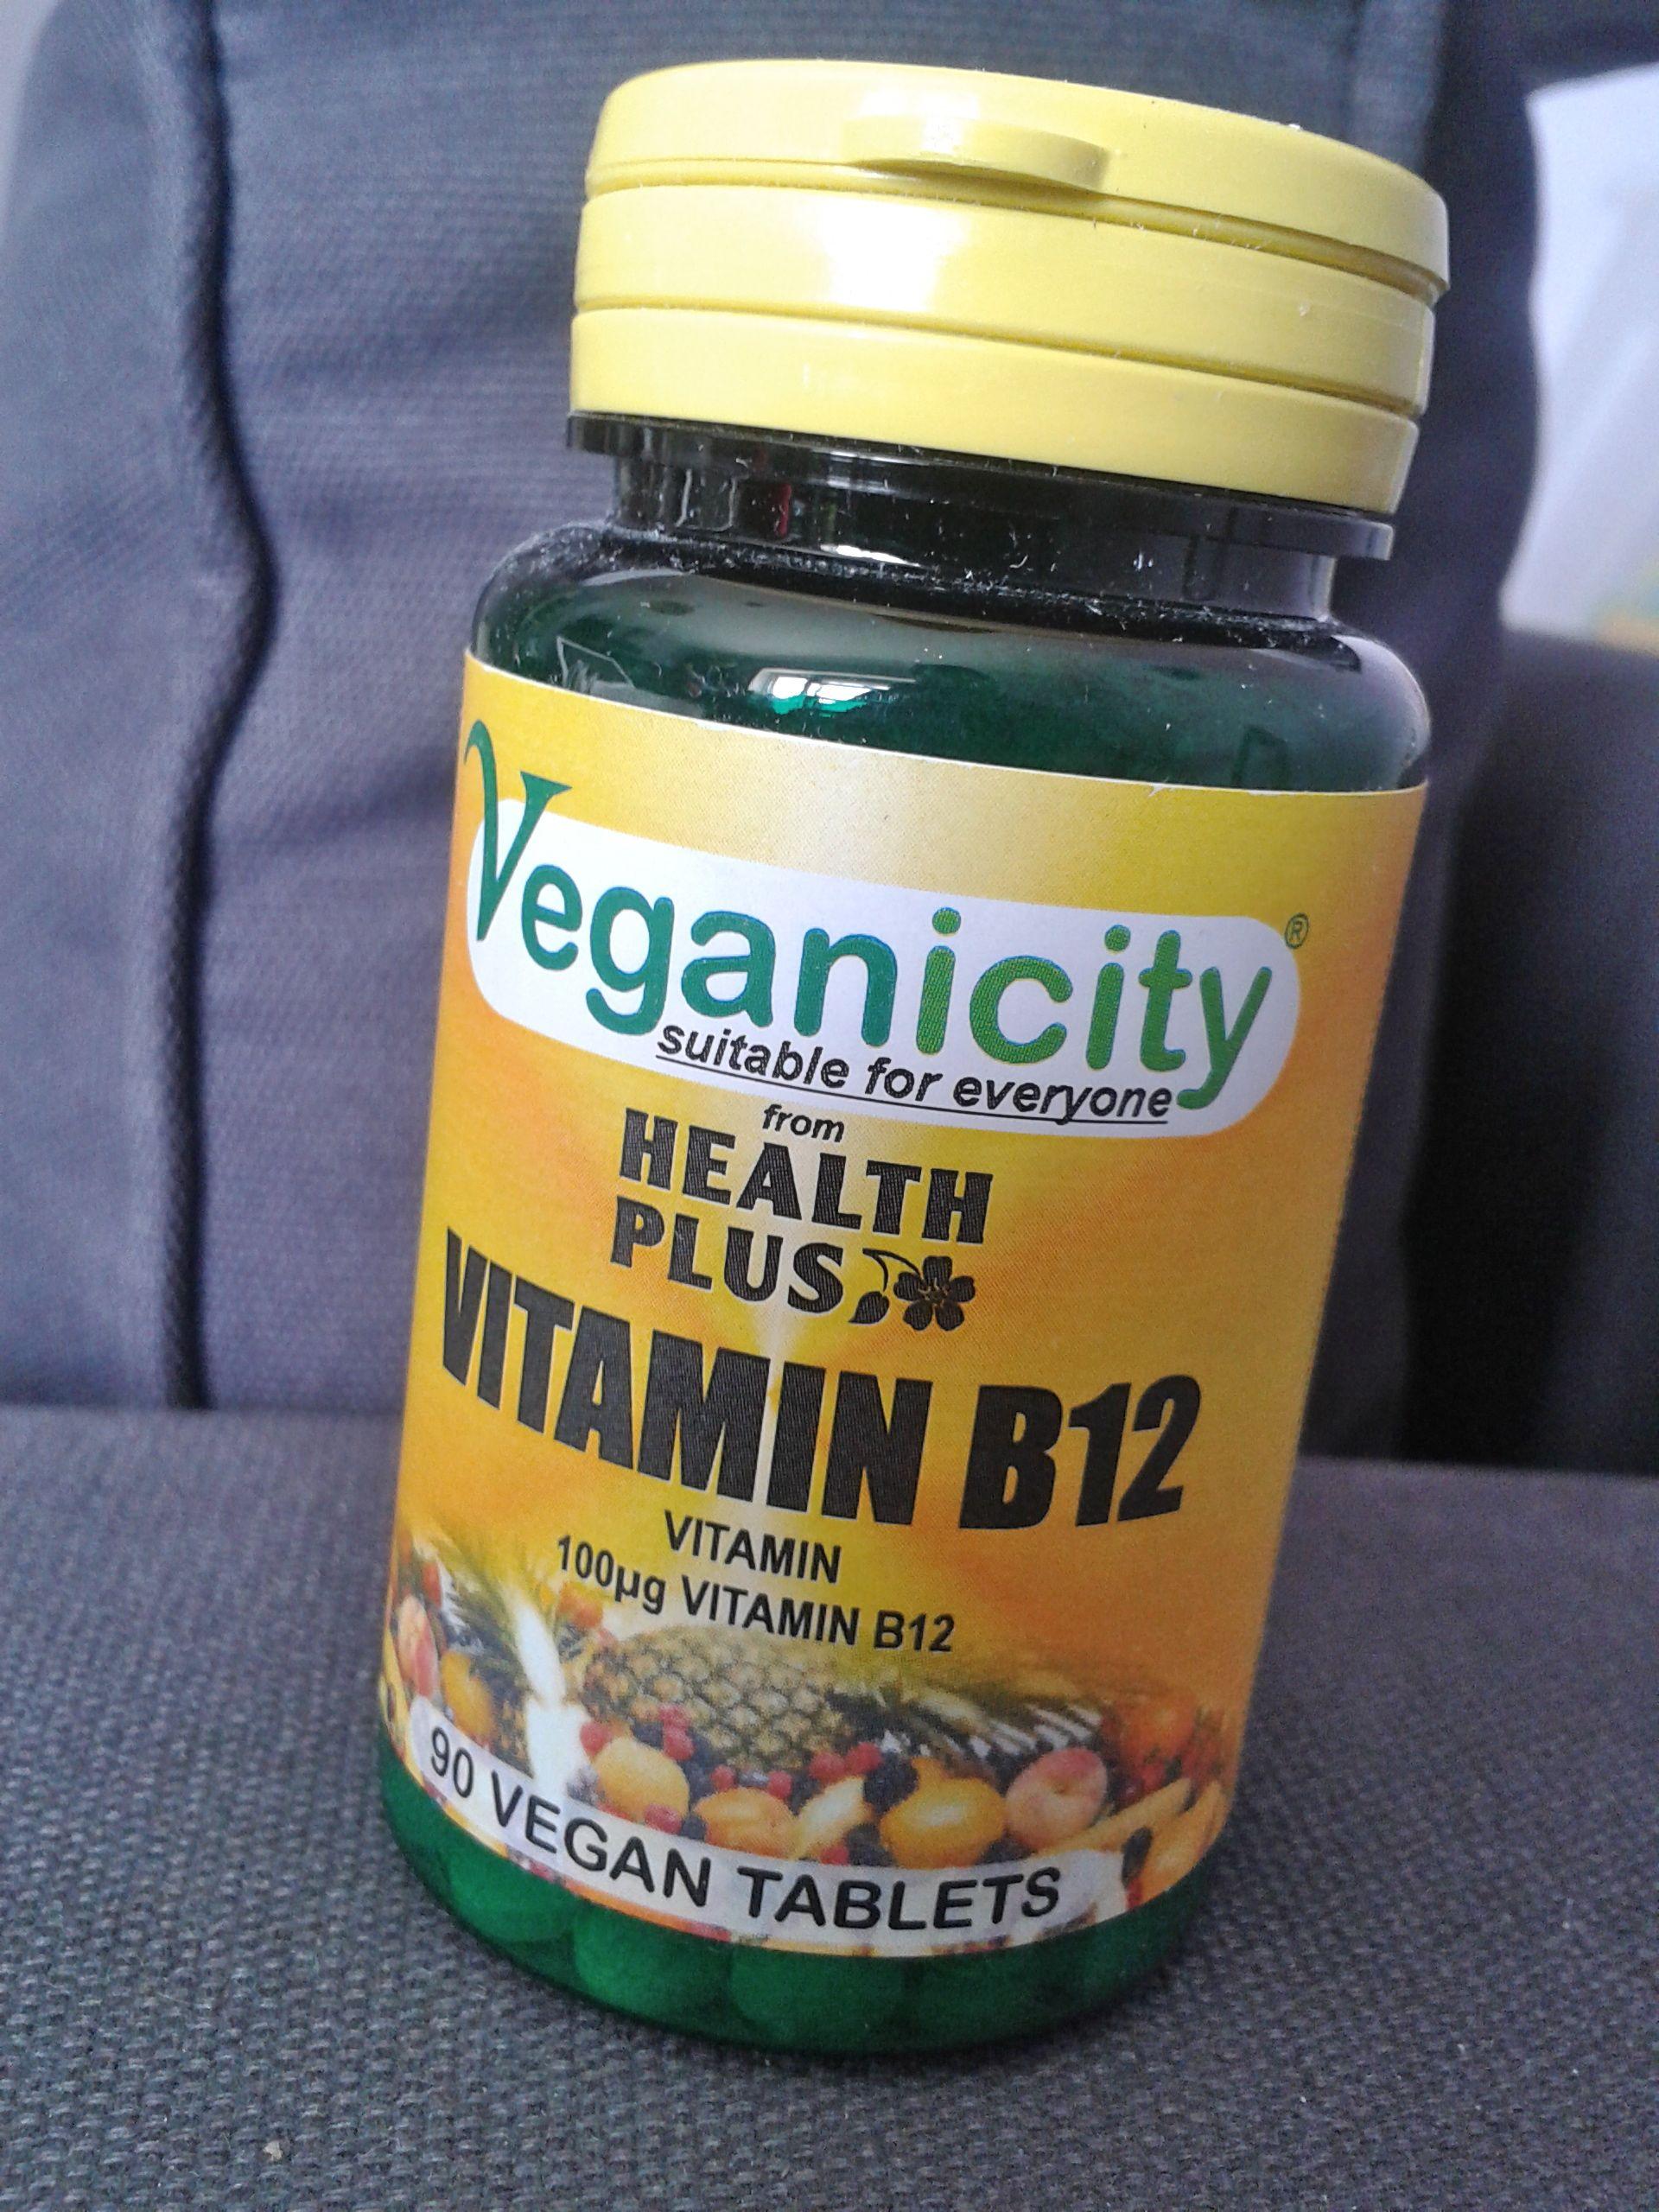 https://i1.wp.com/fatgayvegan.com/wp-content/uploads/2013/07/veganicity.jpg?fit=1920%2C2560